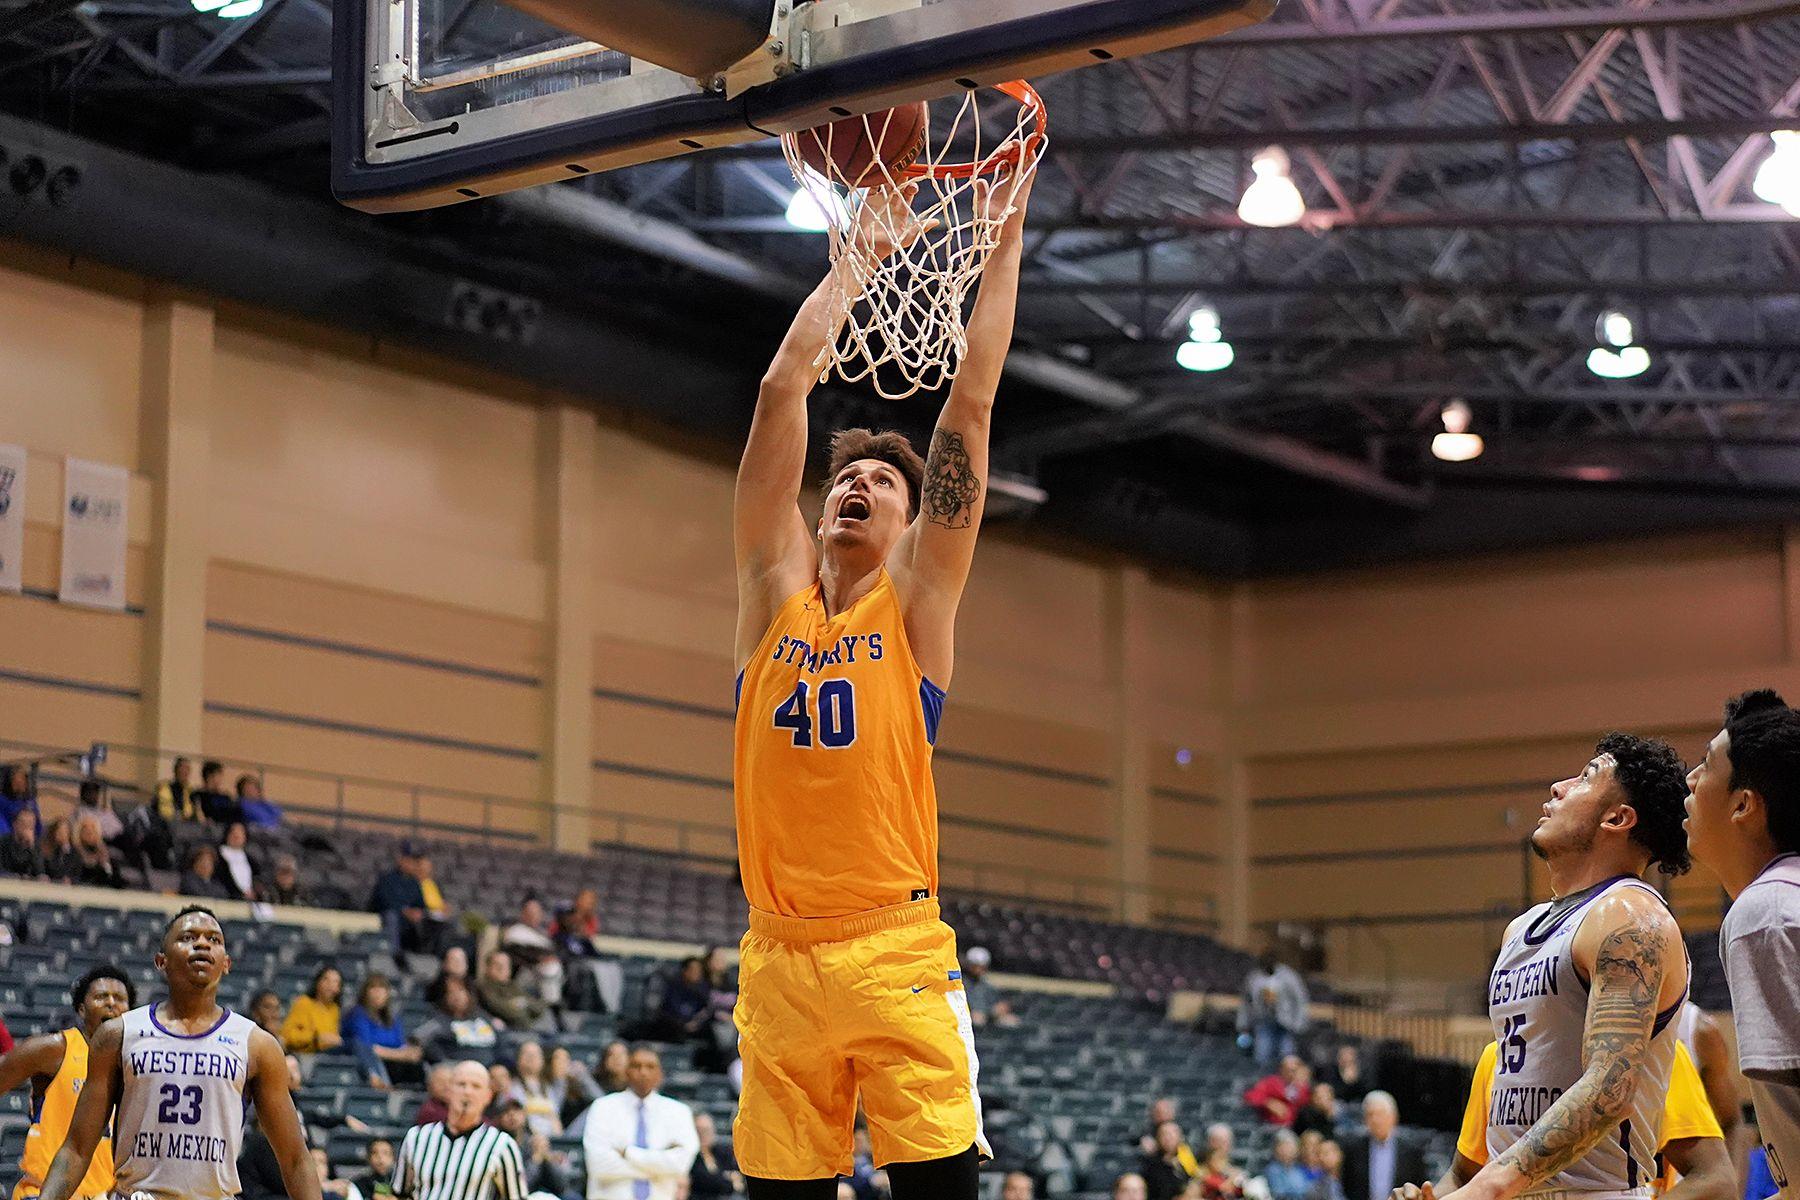 Balanced Attack Lifts Men S Hoops Past Mustangs Mens Basketball Athlete Men